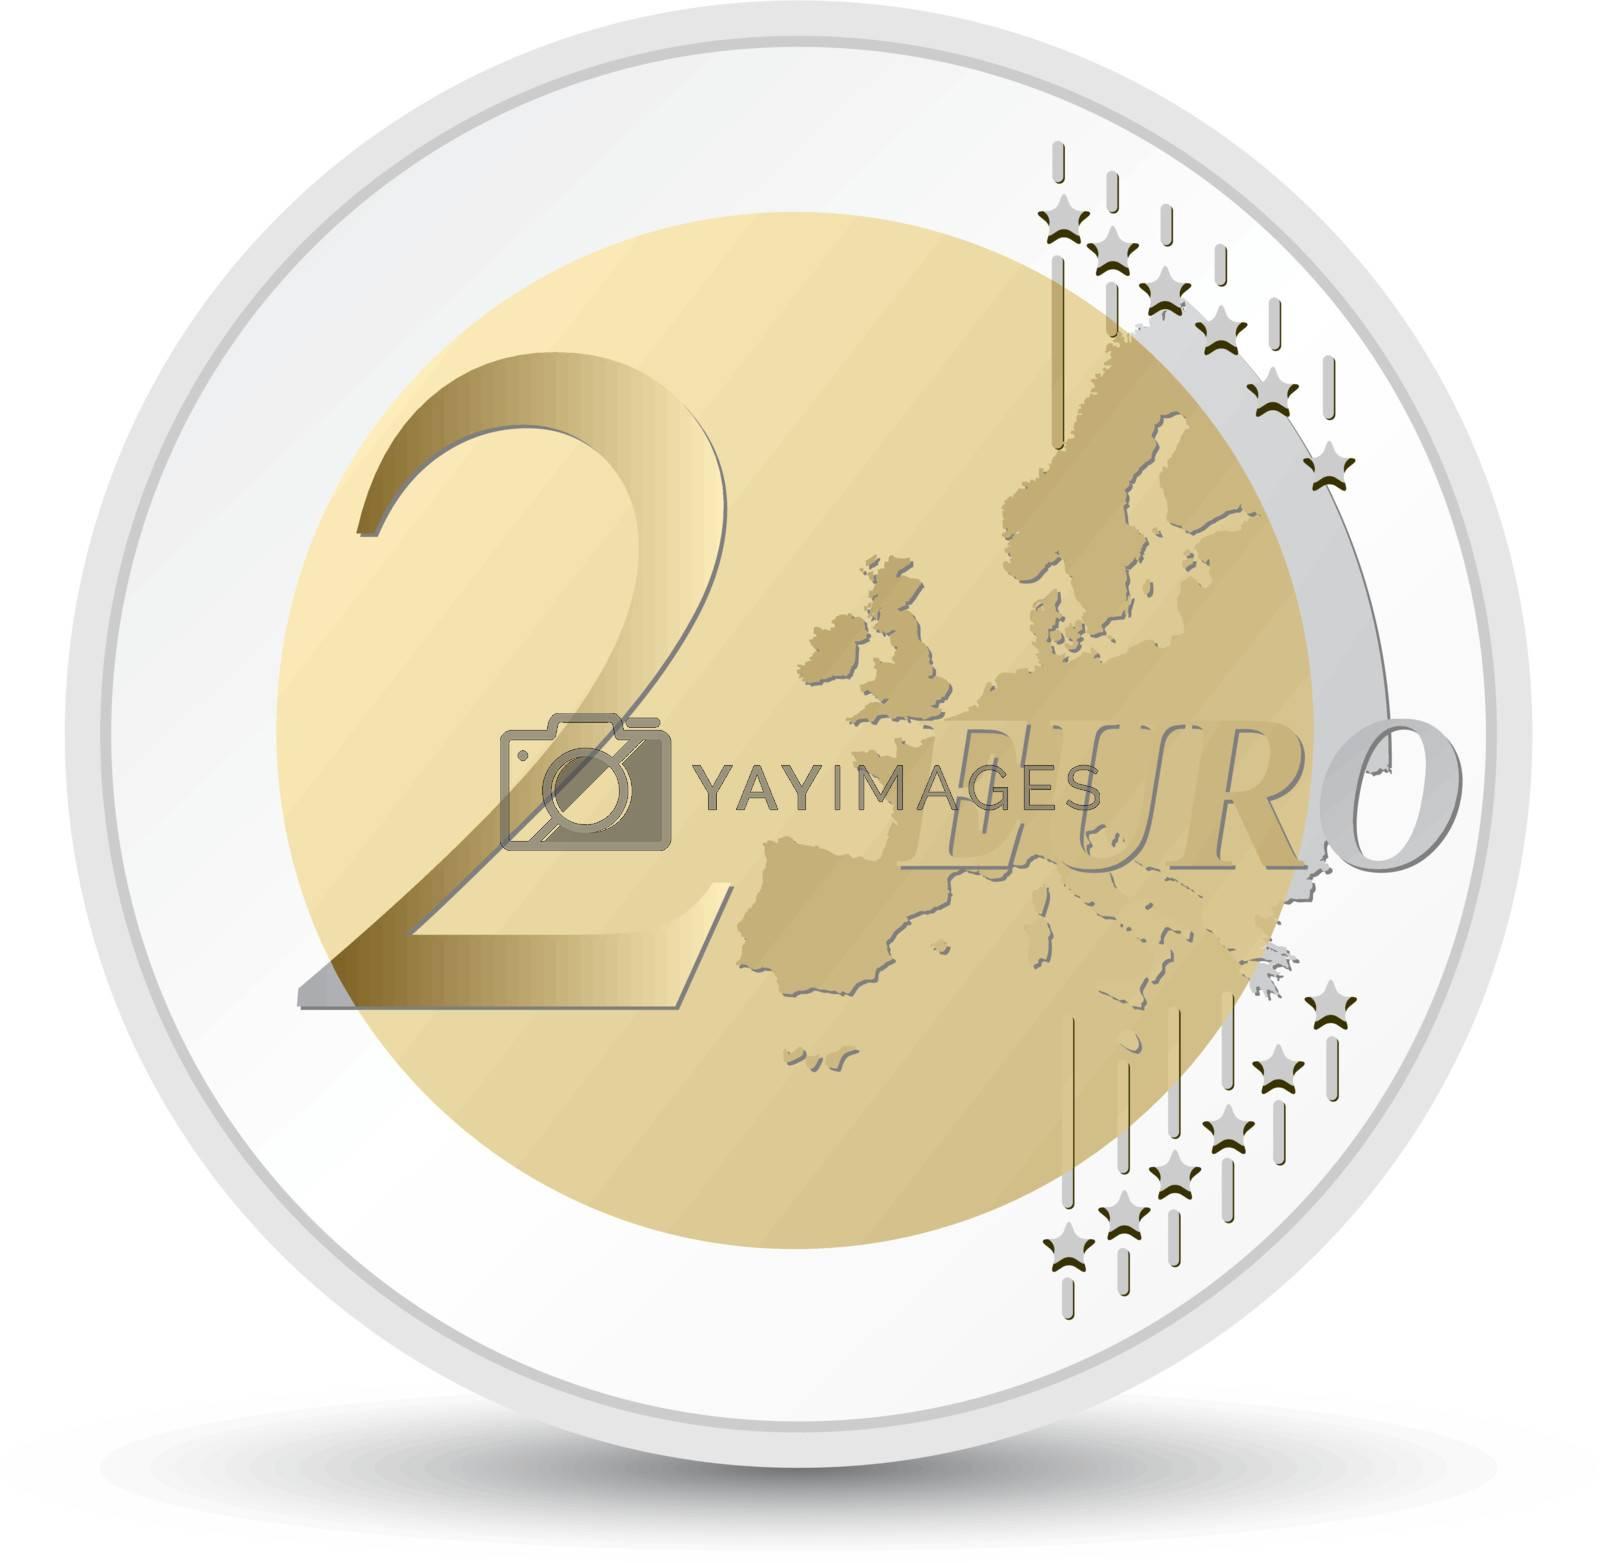 euro coin by jfcalheiros